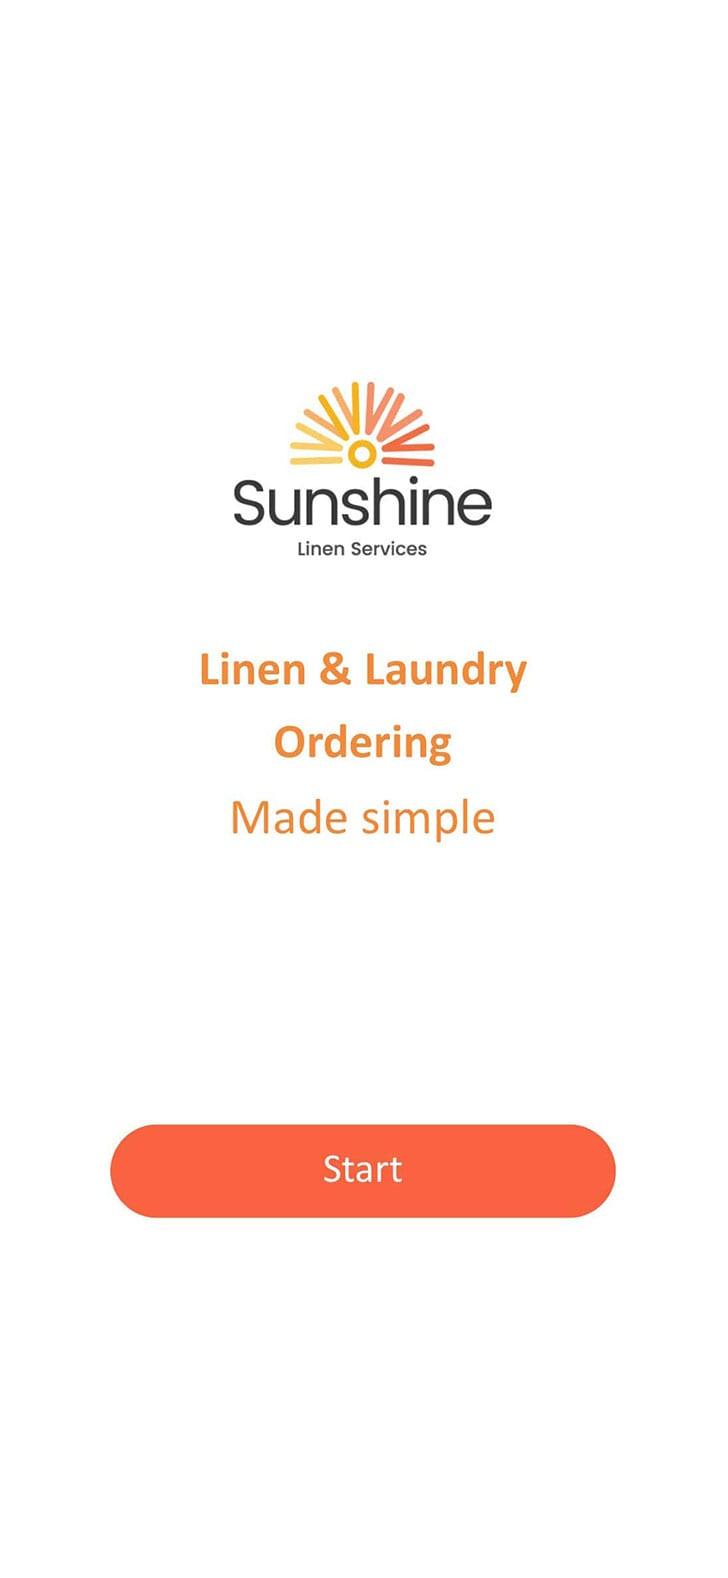 Sunshine-splash-screen